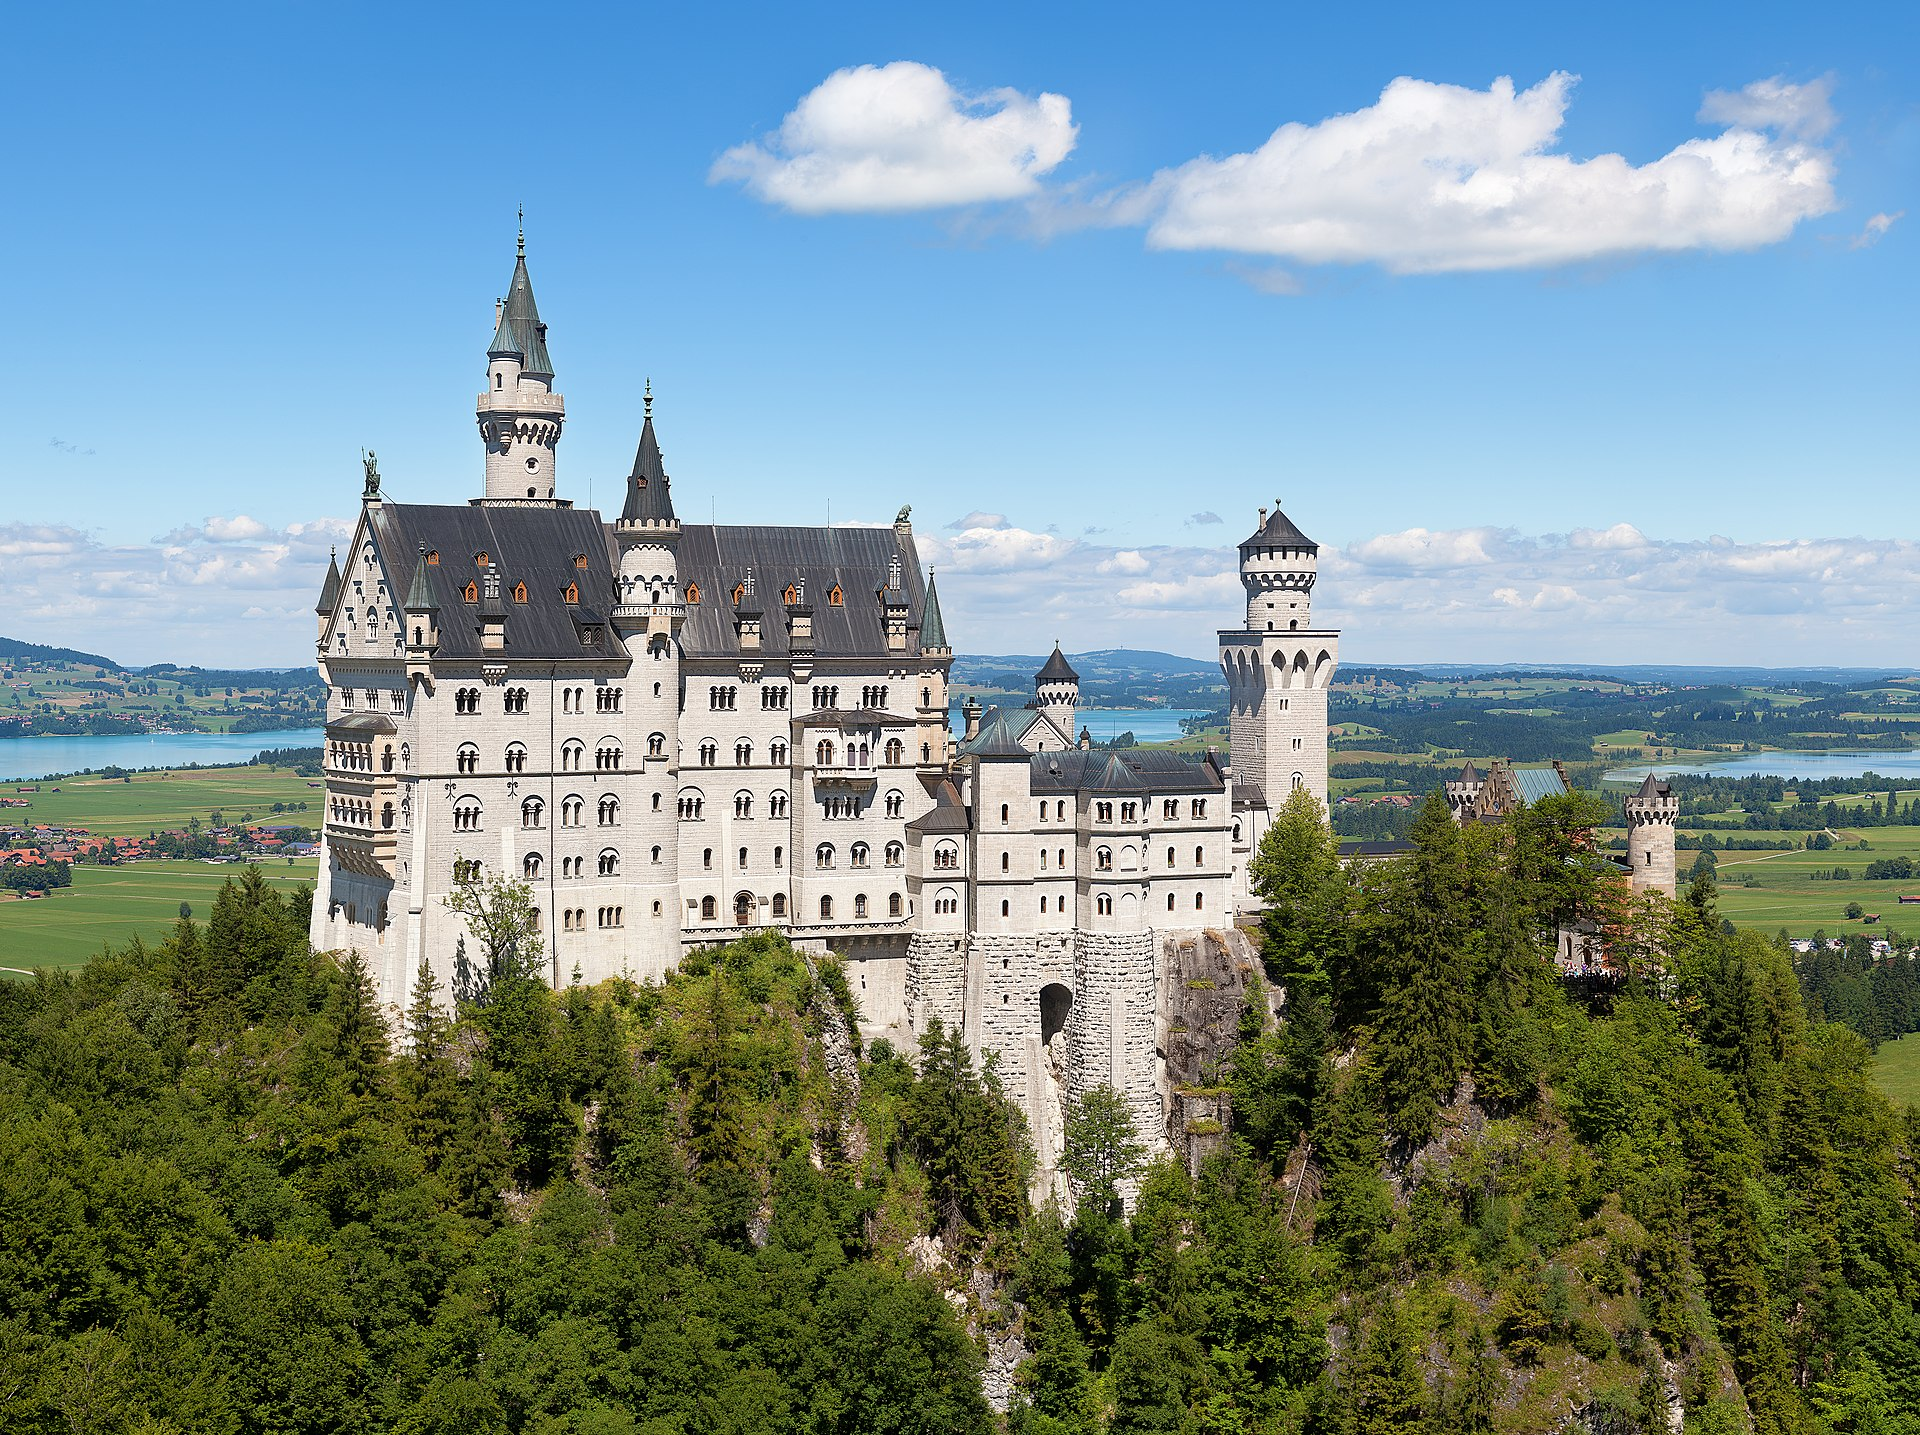 must-see plaatsen in Duitsland - Neuschwanstein